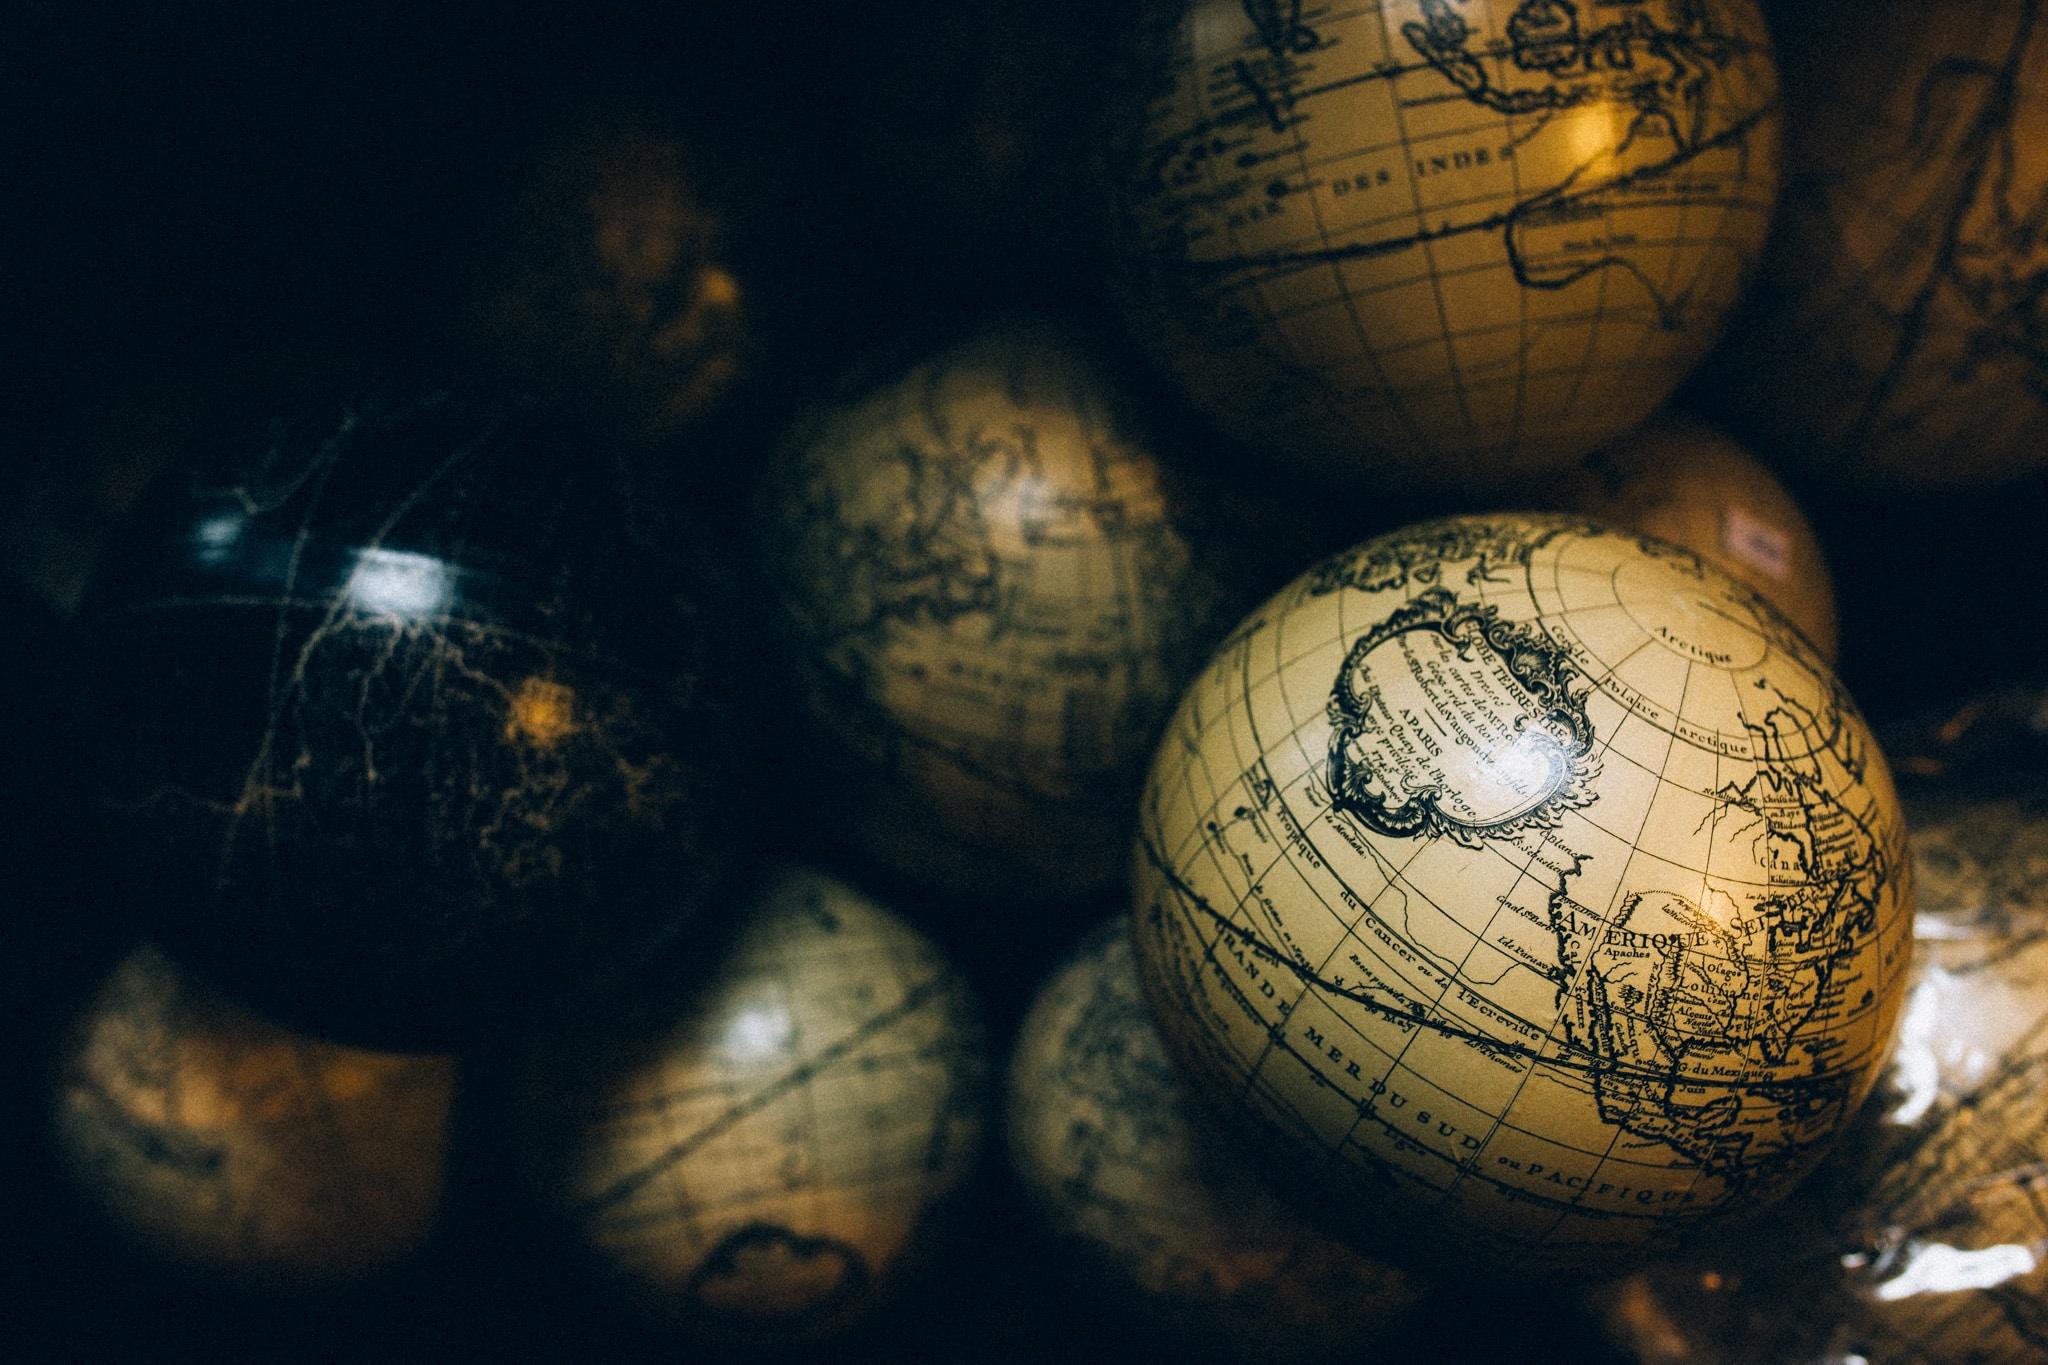 Create worlds stories